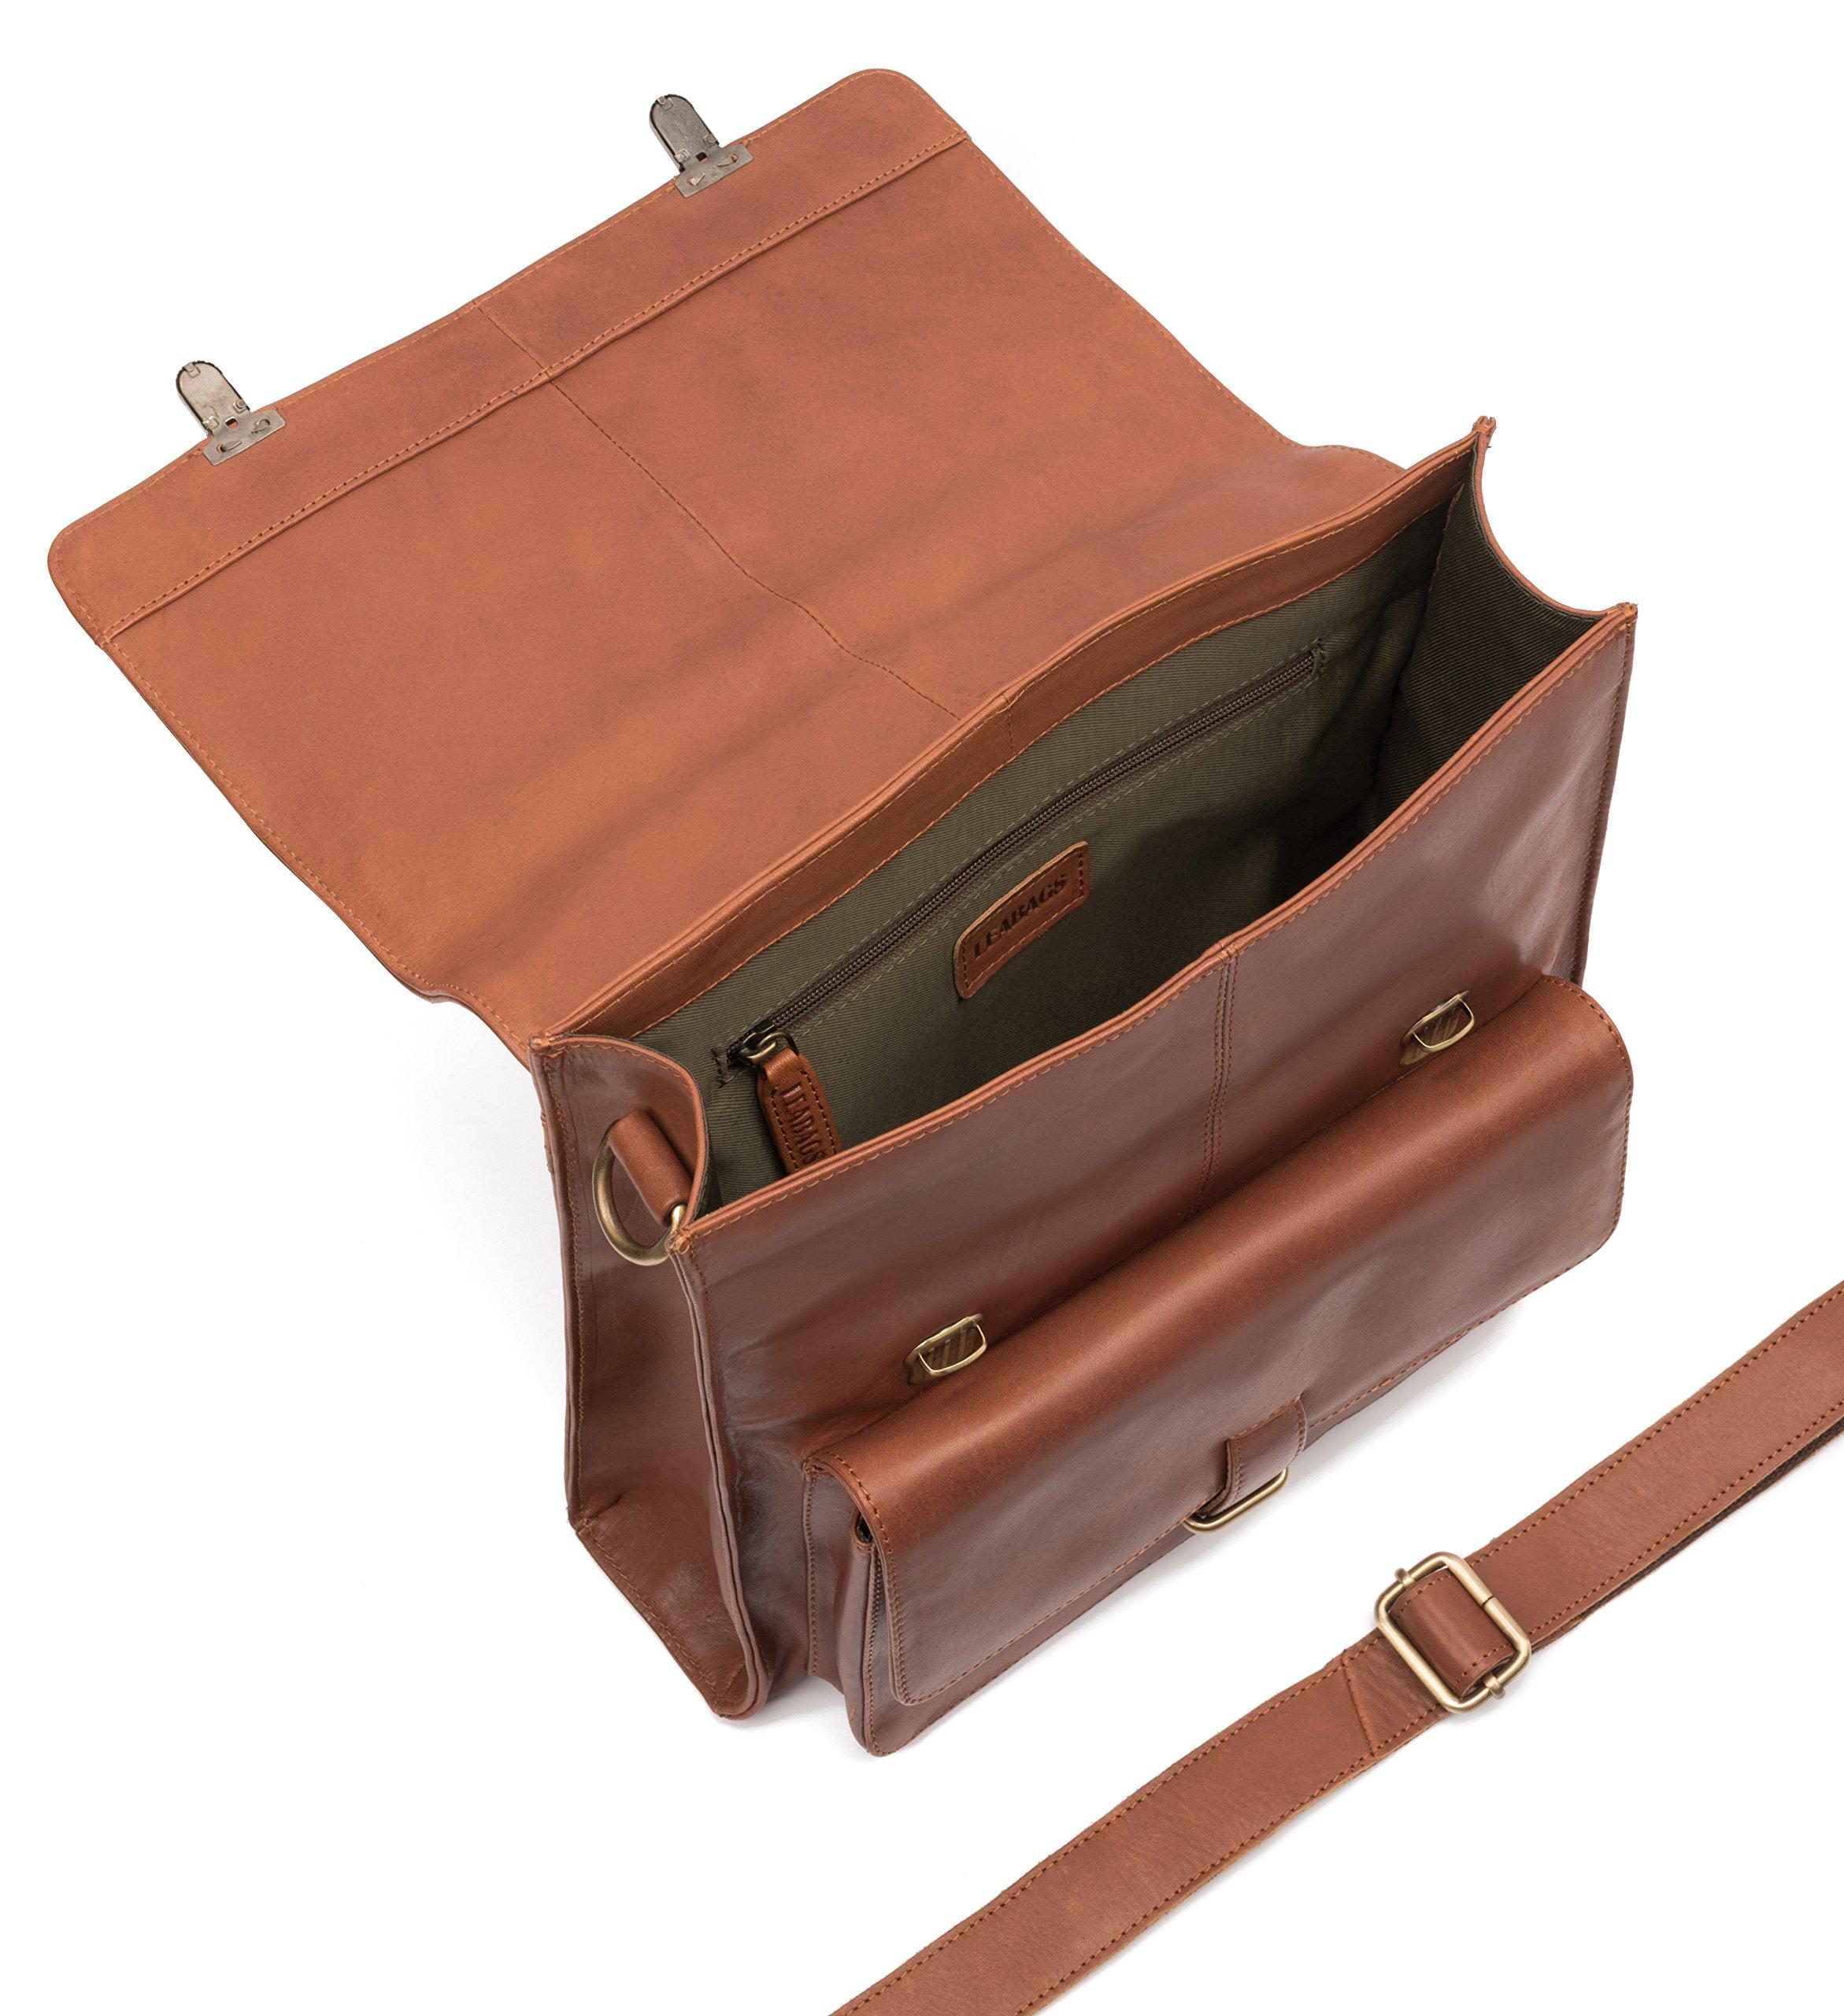 91rhNDR%2Bz8L - LEABAGS Lille maletín de auténtico Cuero búfalo en el Estilo Vintage